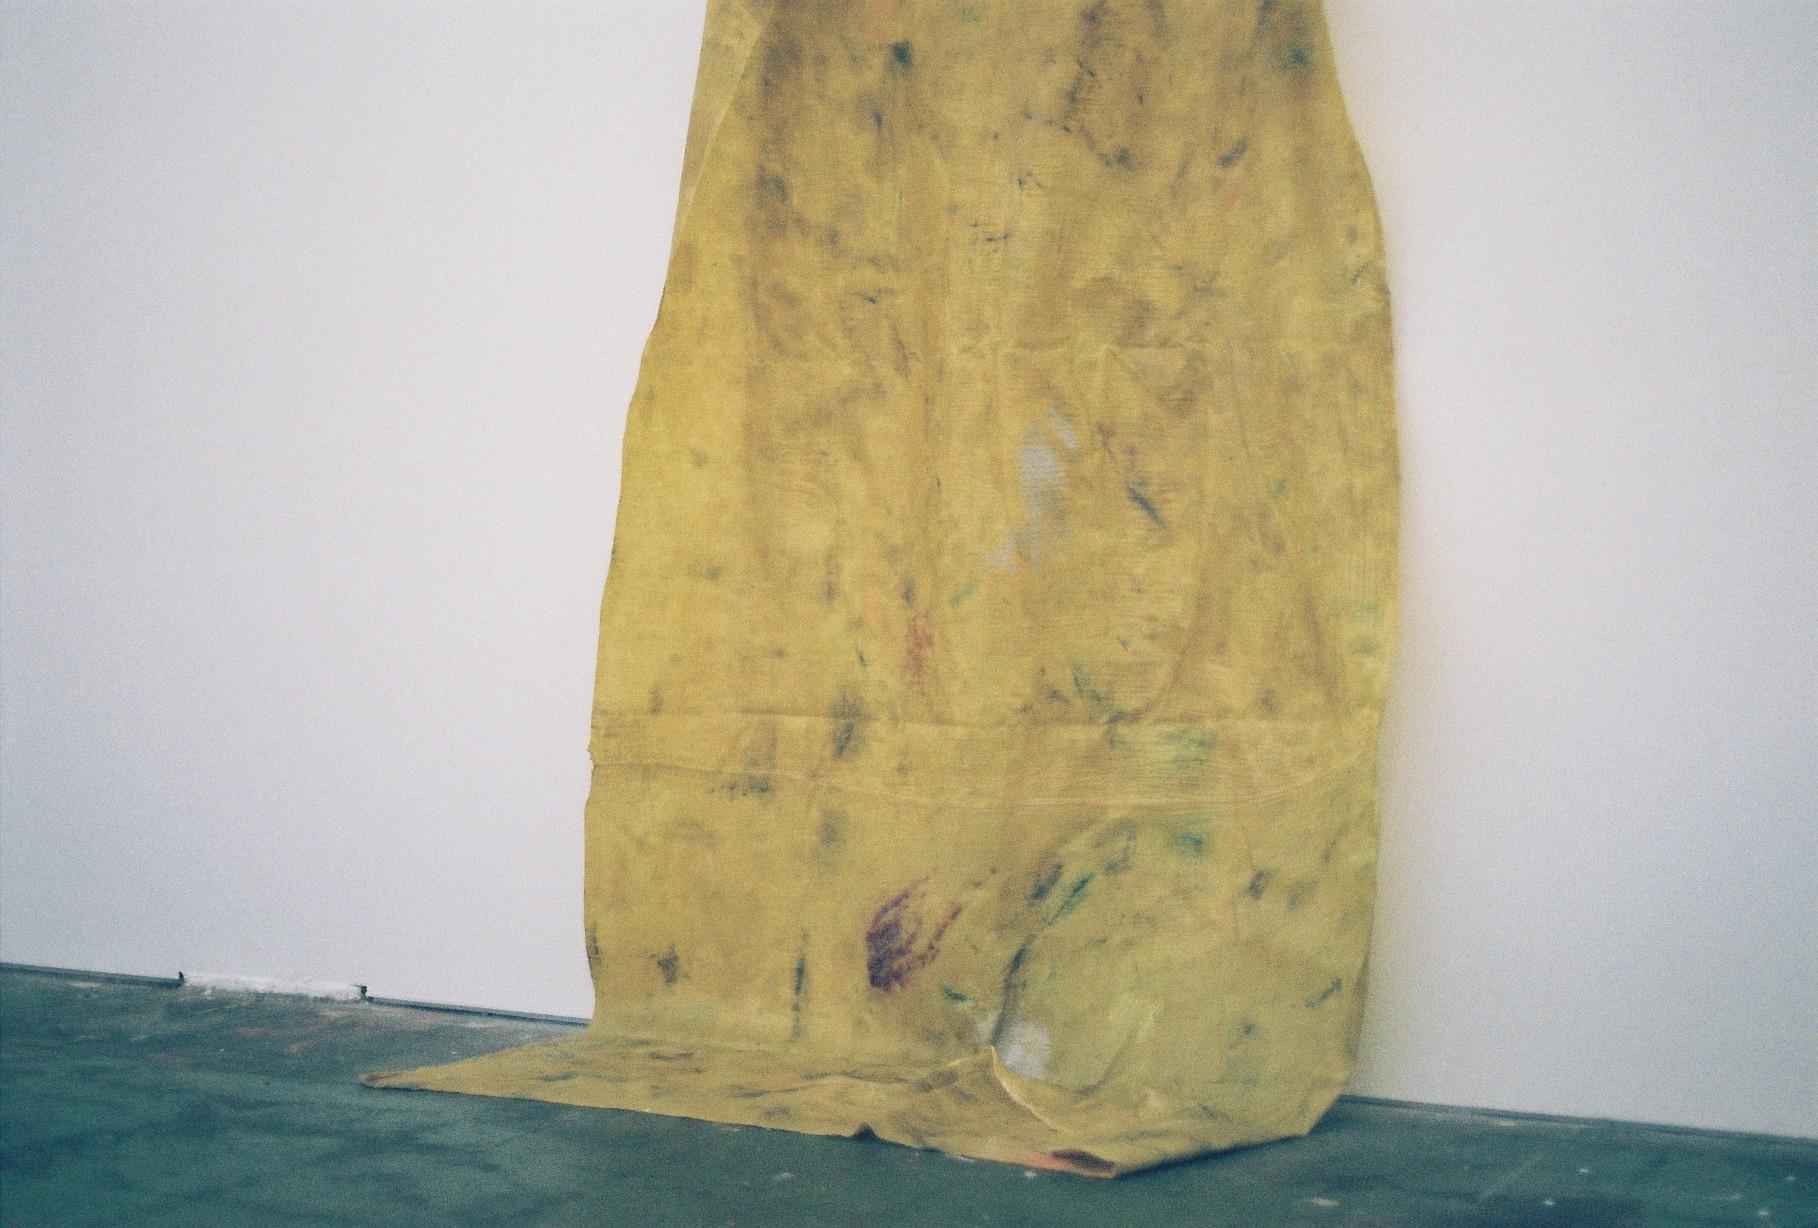 Jahnne Pasco–White,  turning the circle , 2016 oil, varnish on muslin courtesy Daine Singer, Melbourne